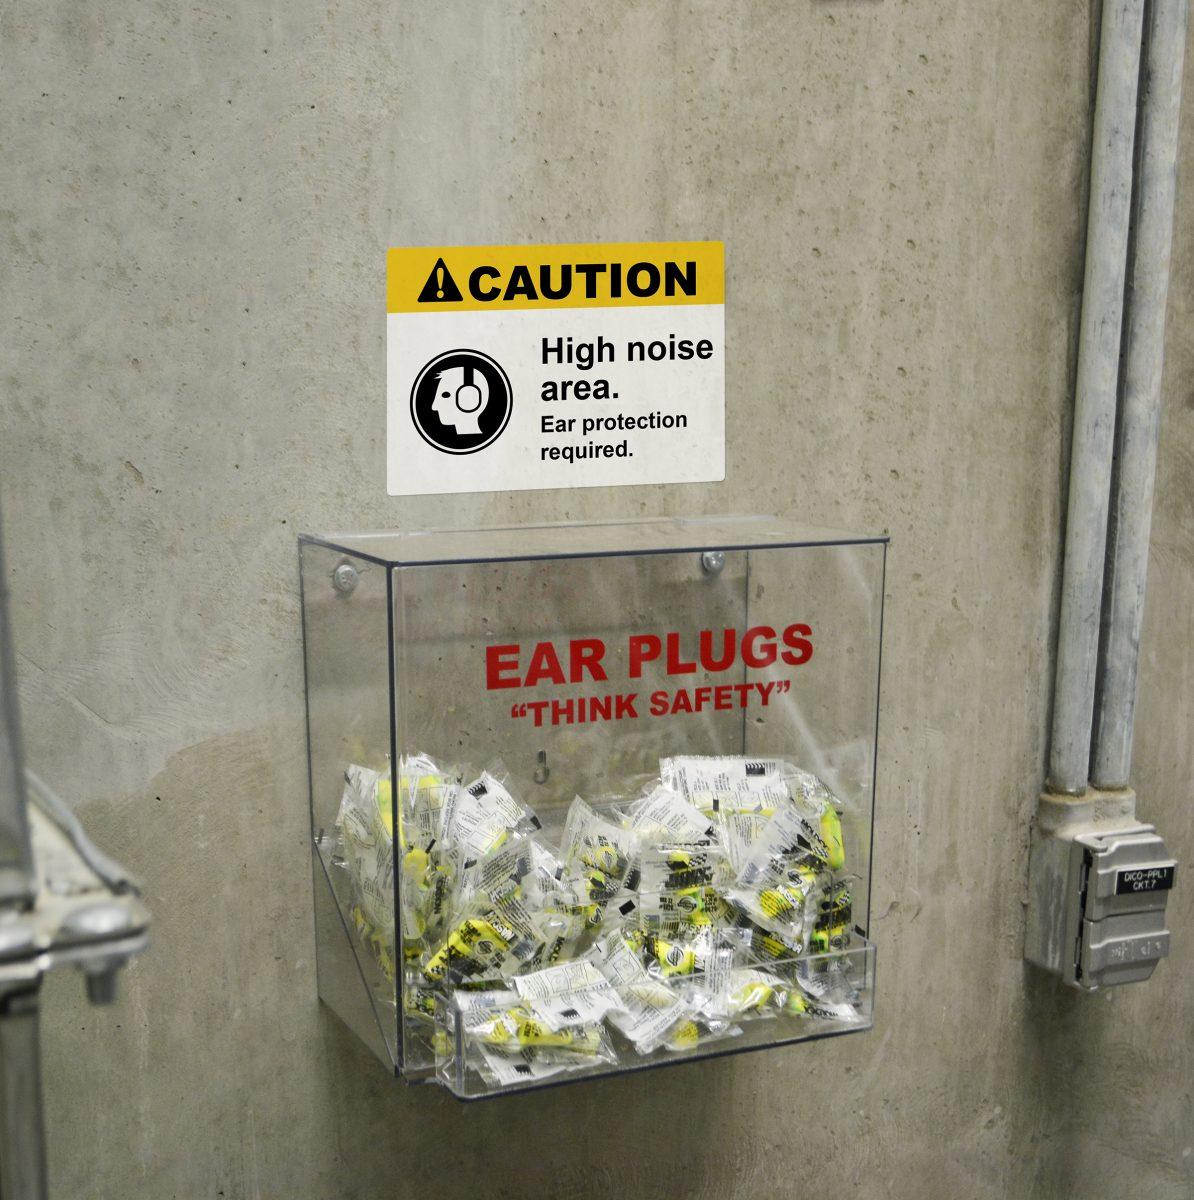 Caution High Noise Area Sign